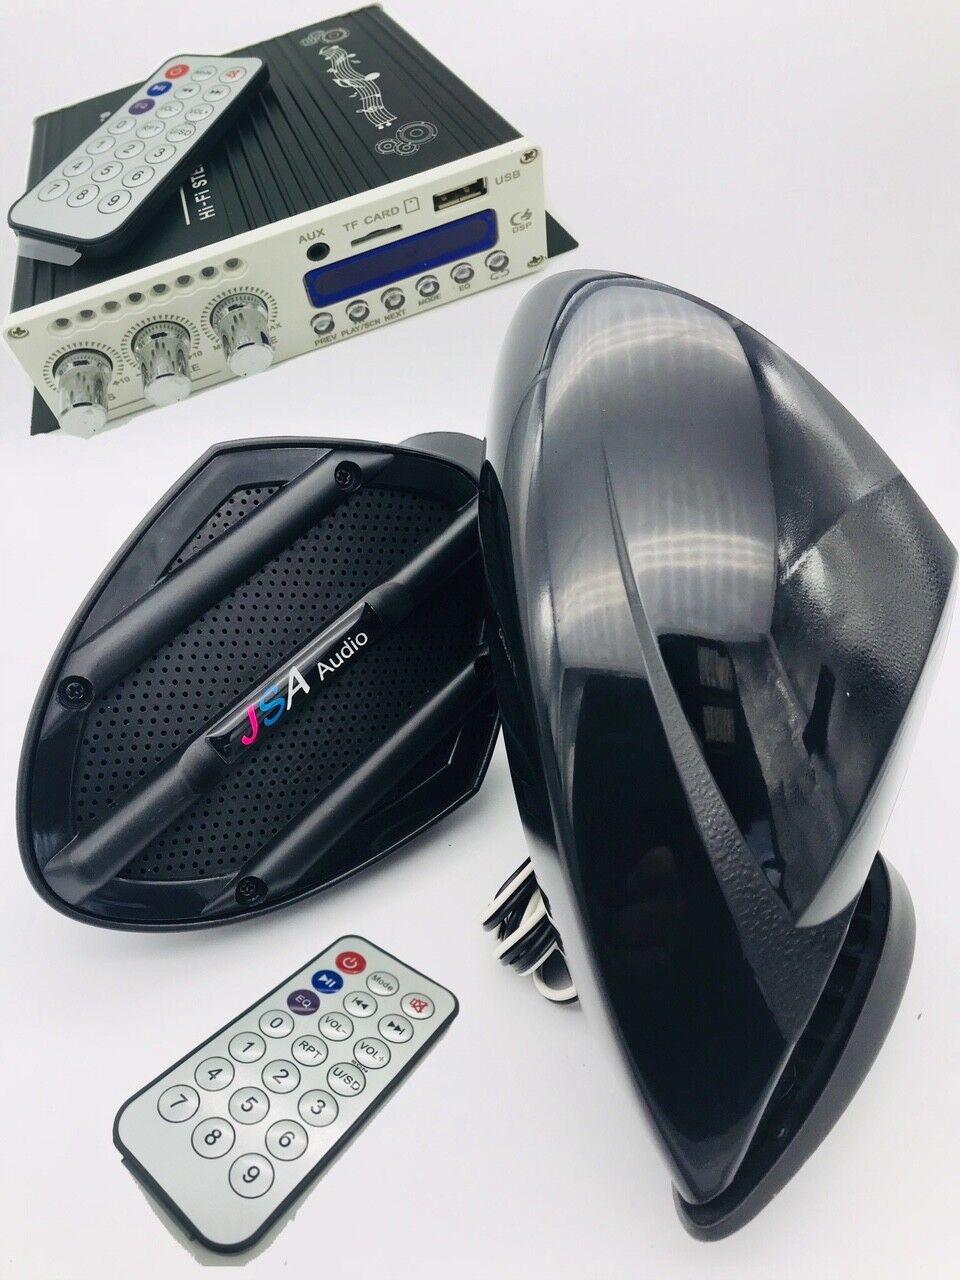 JETSKI 2 SPEAKER KIT STEREO AMP blueETOOTH SYSTEM UNIVERSAL RXT GTS SEADOO DIY